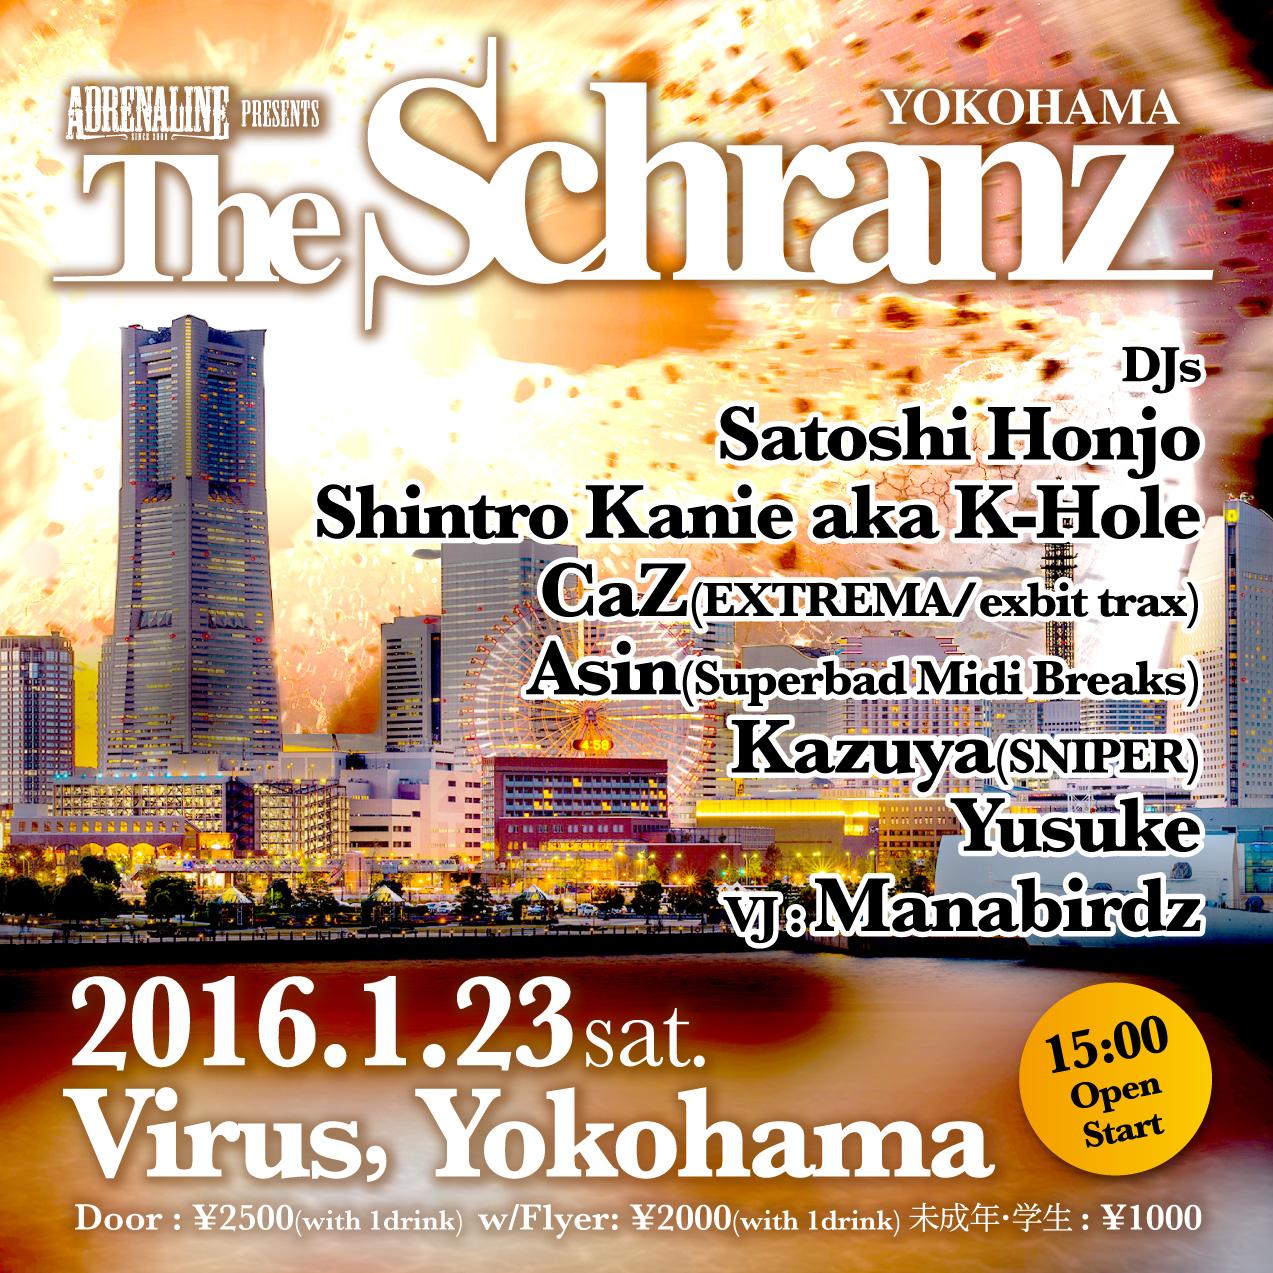 theshranz_yokohama-01